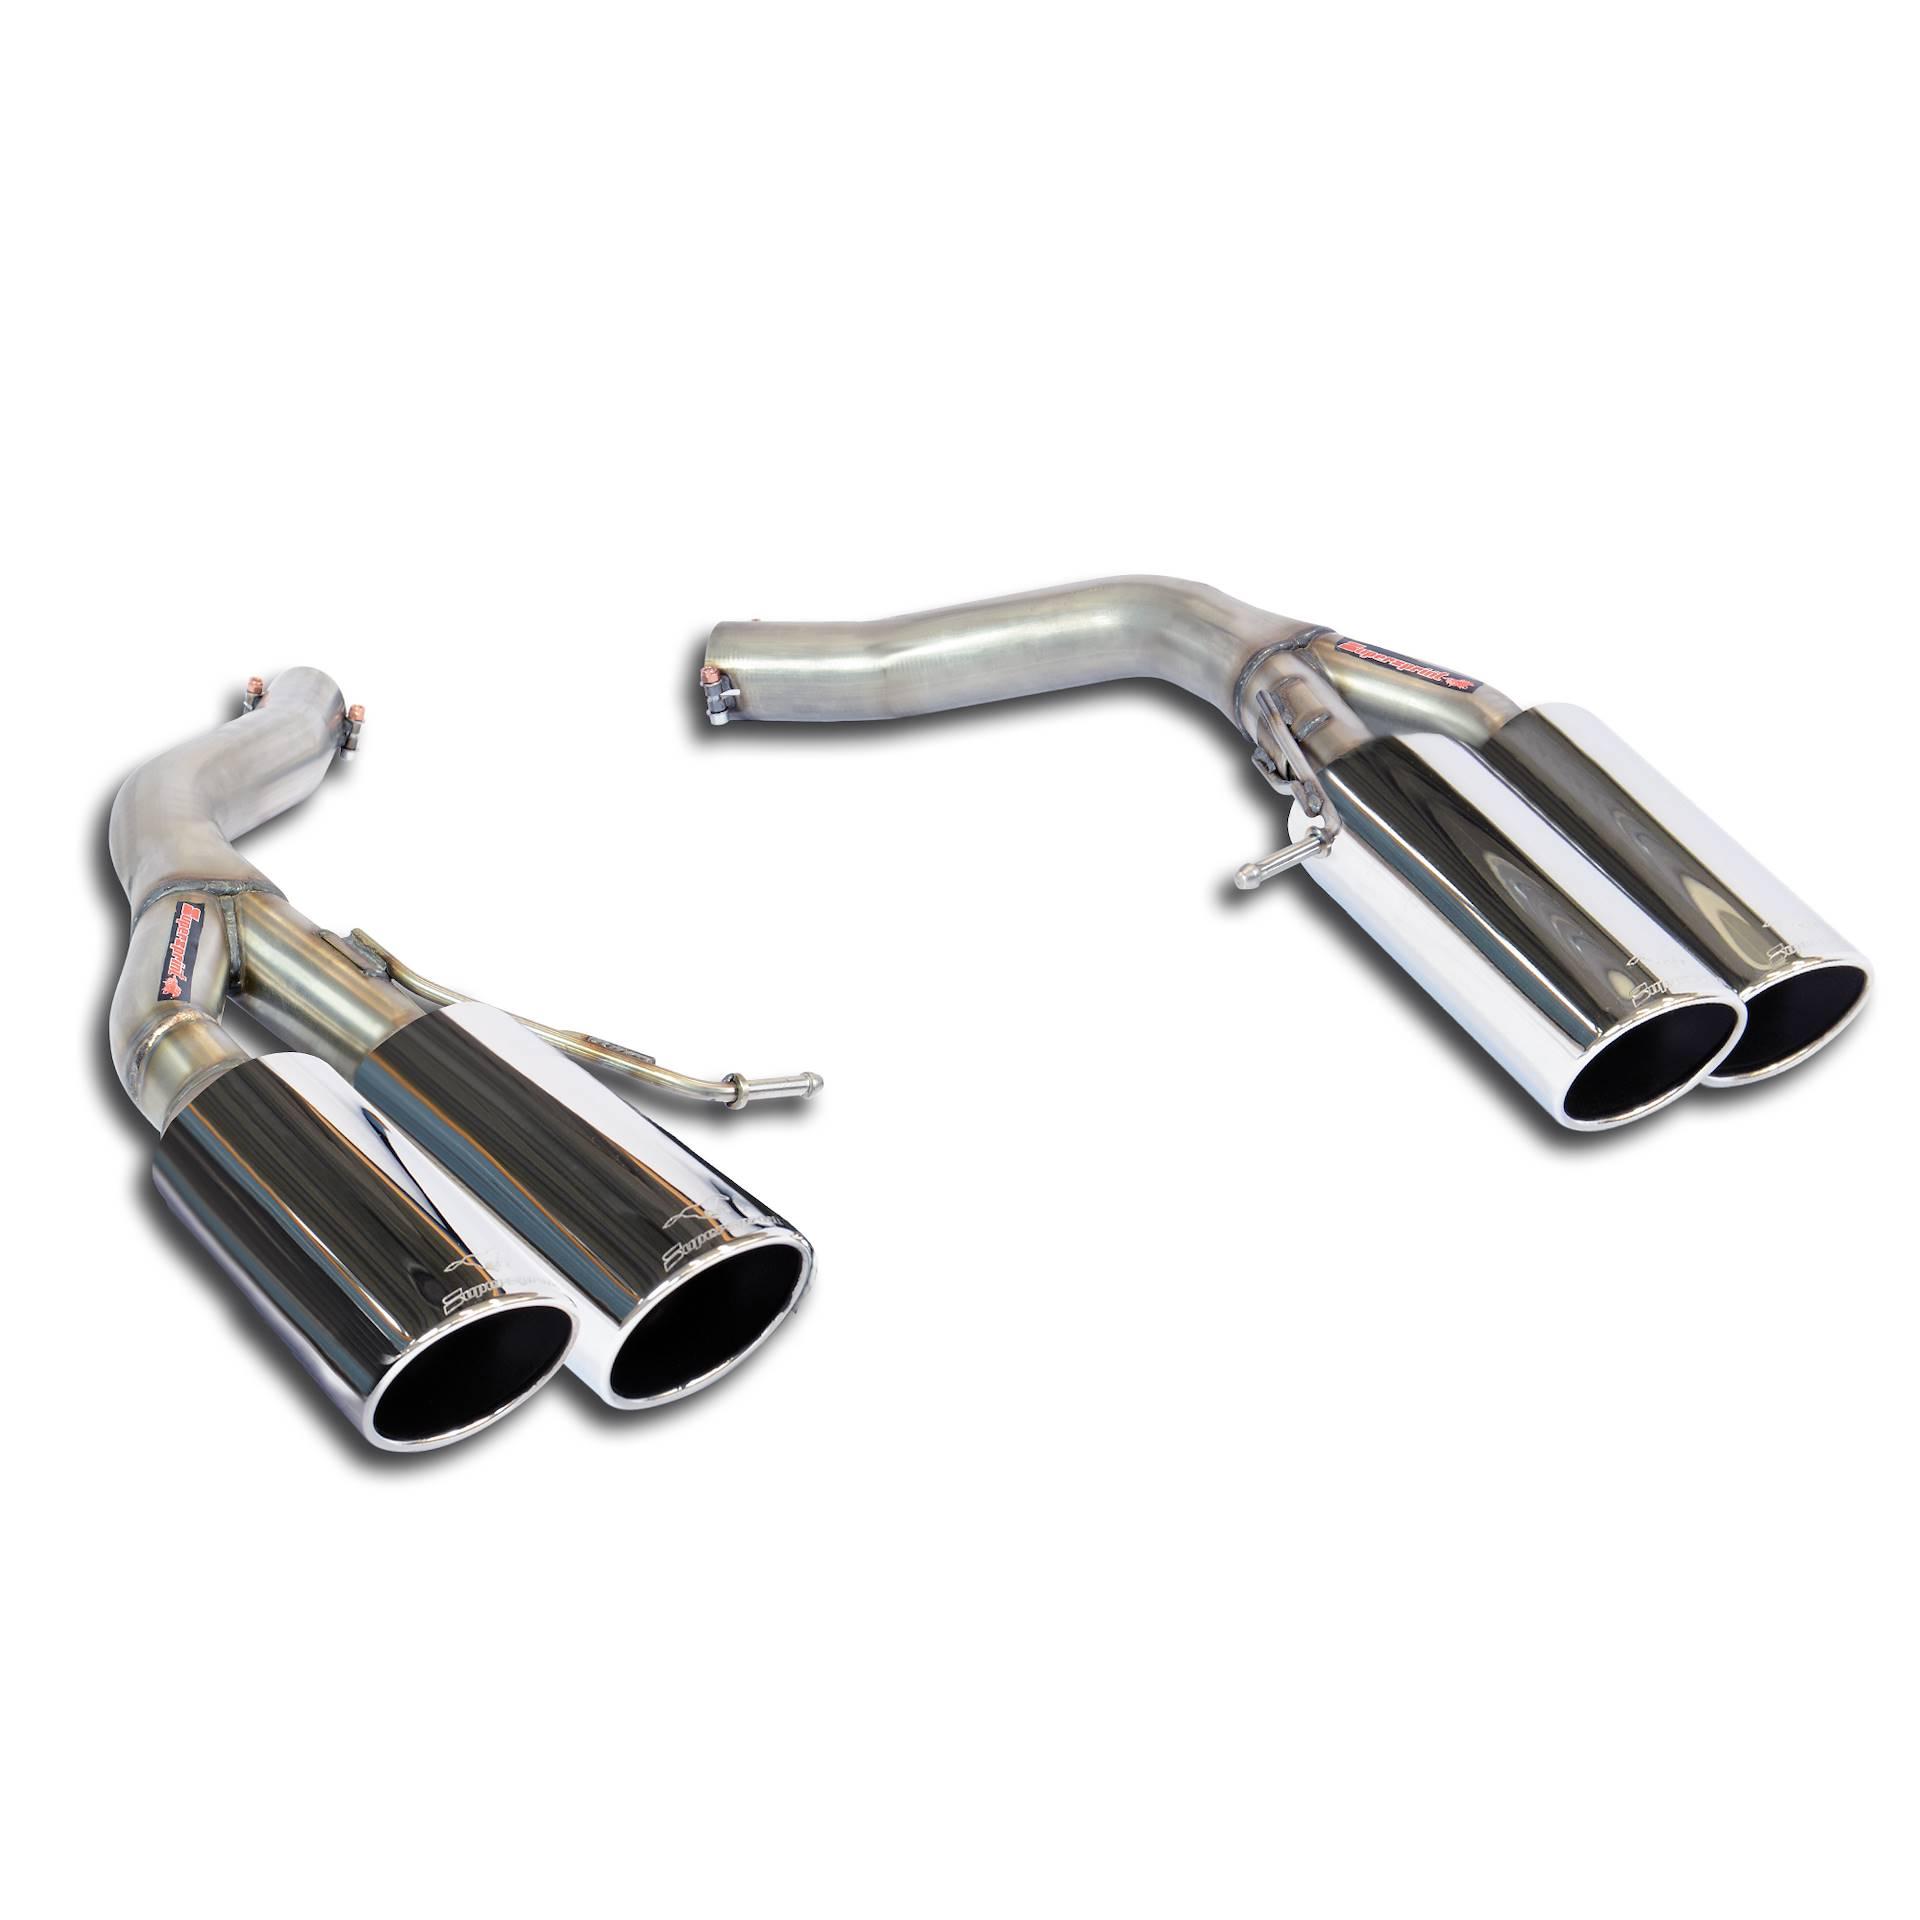 Performance sport exhaust for BMW F10 - F11 535i xDrive, BMW F10